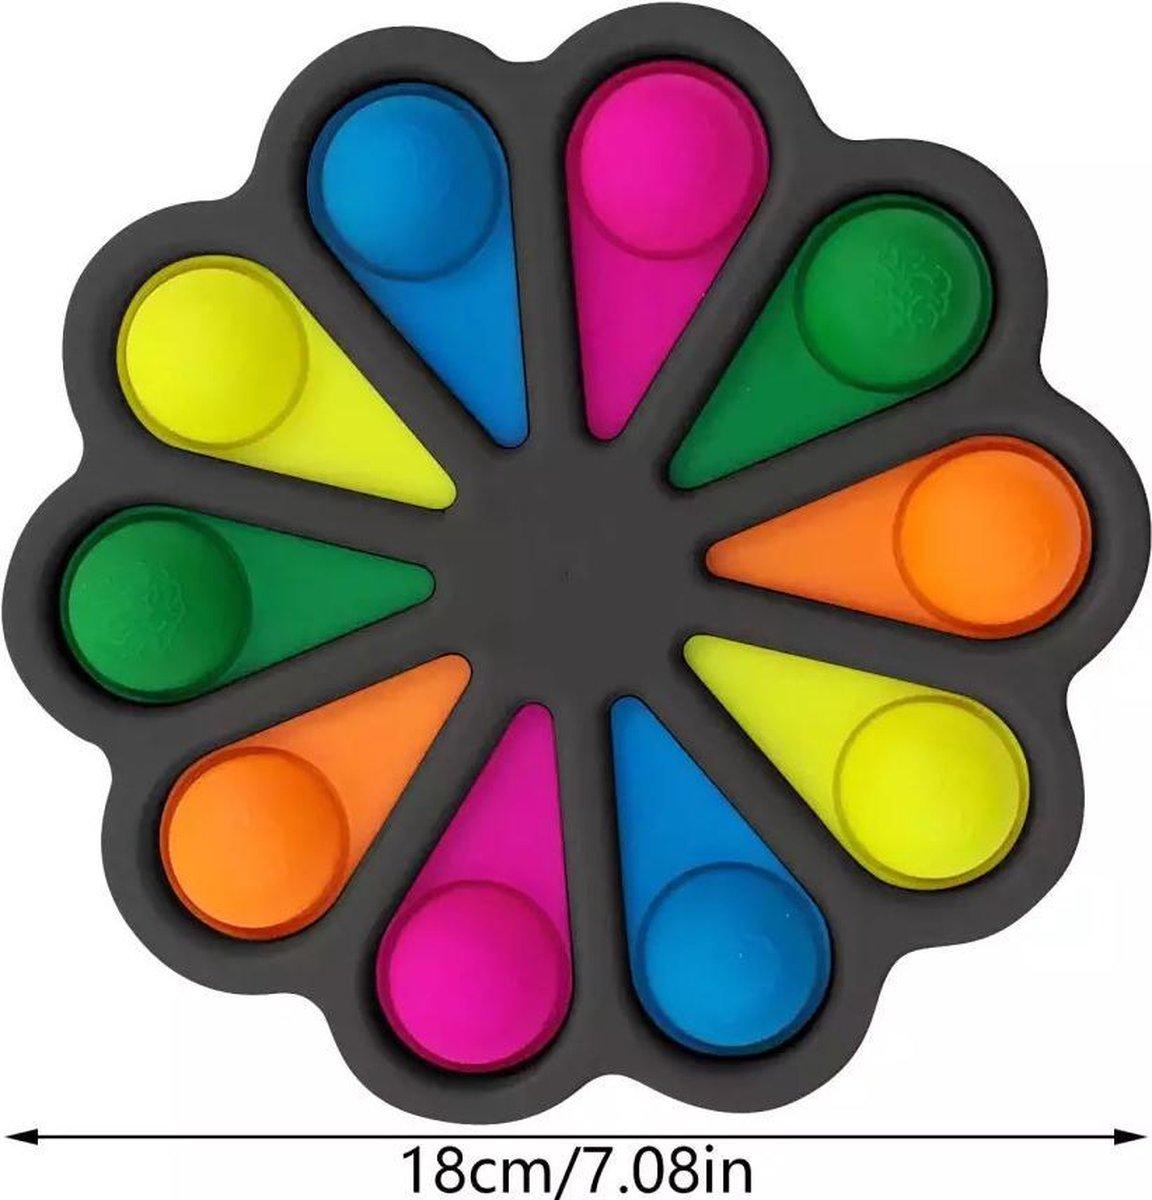 Dimple Digits -Fidget toys-Simple dimple-mega grote-tiktok-zwart